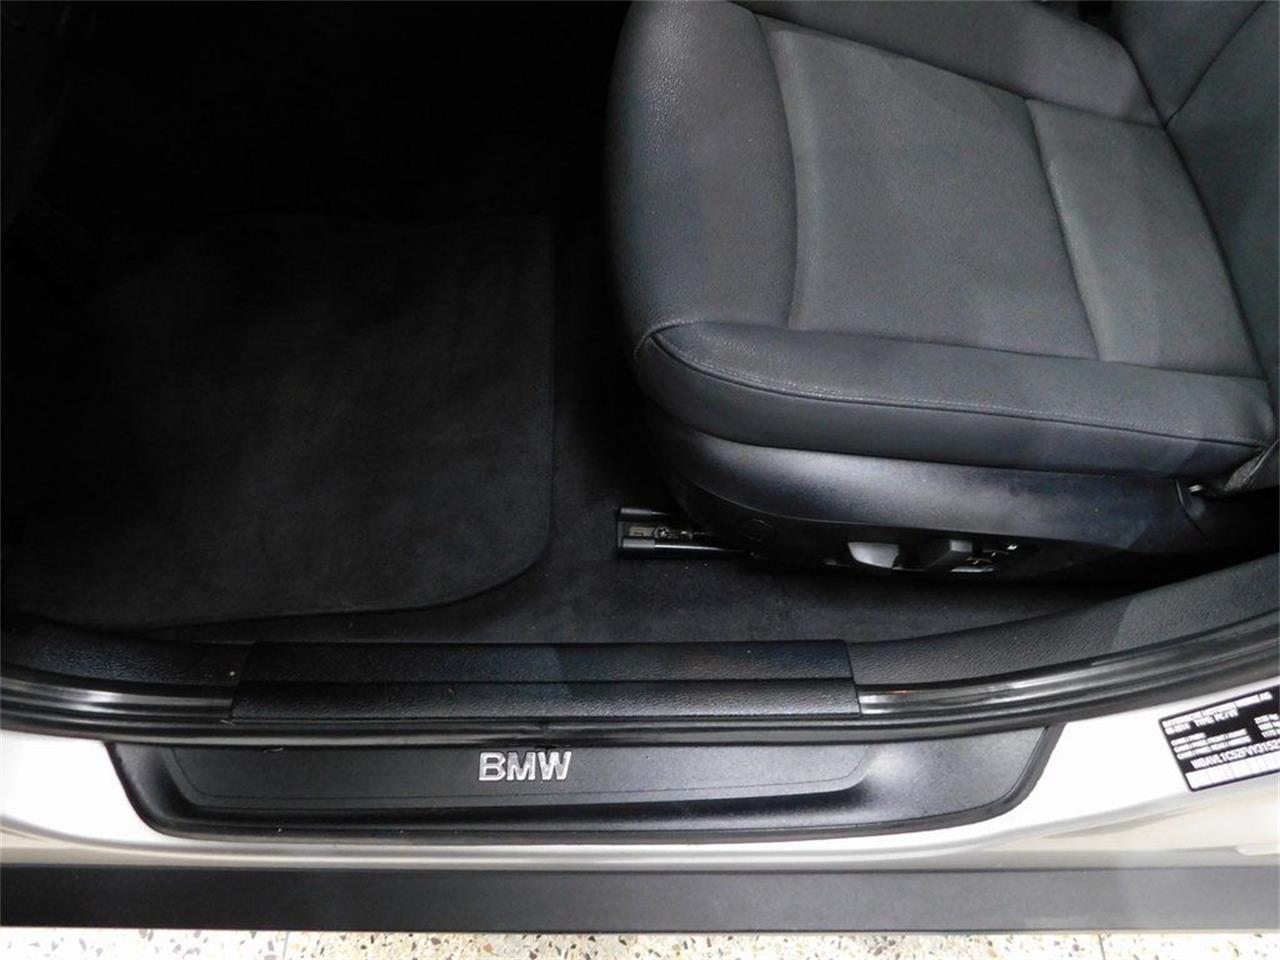 2015 BMW X1 (CC-1373923) for sale in Hamburg, New York